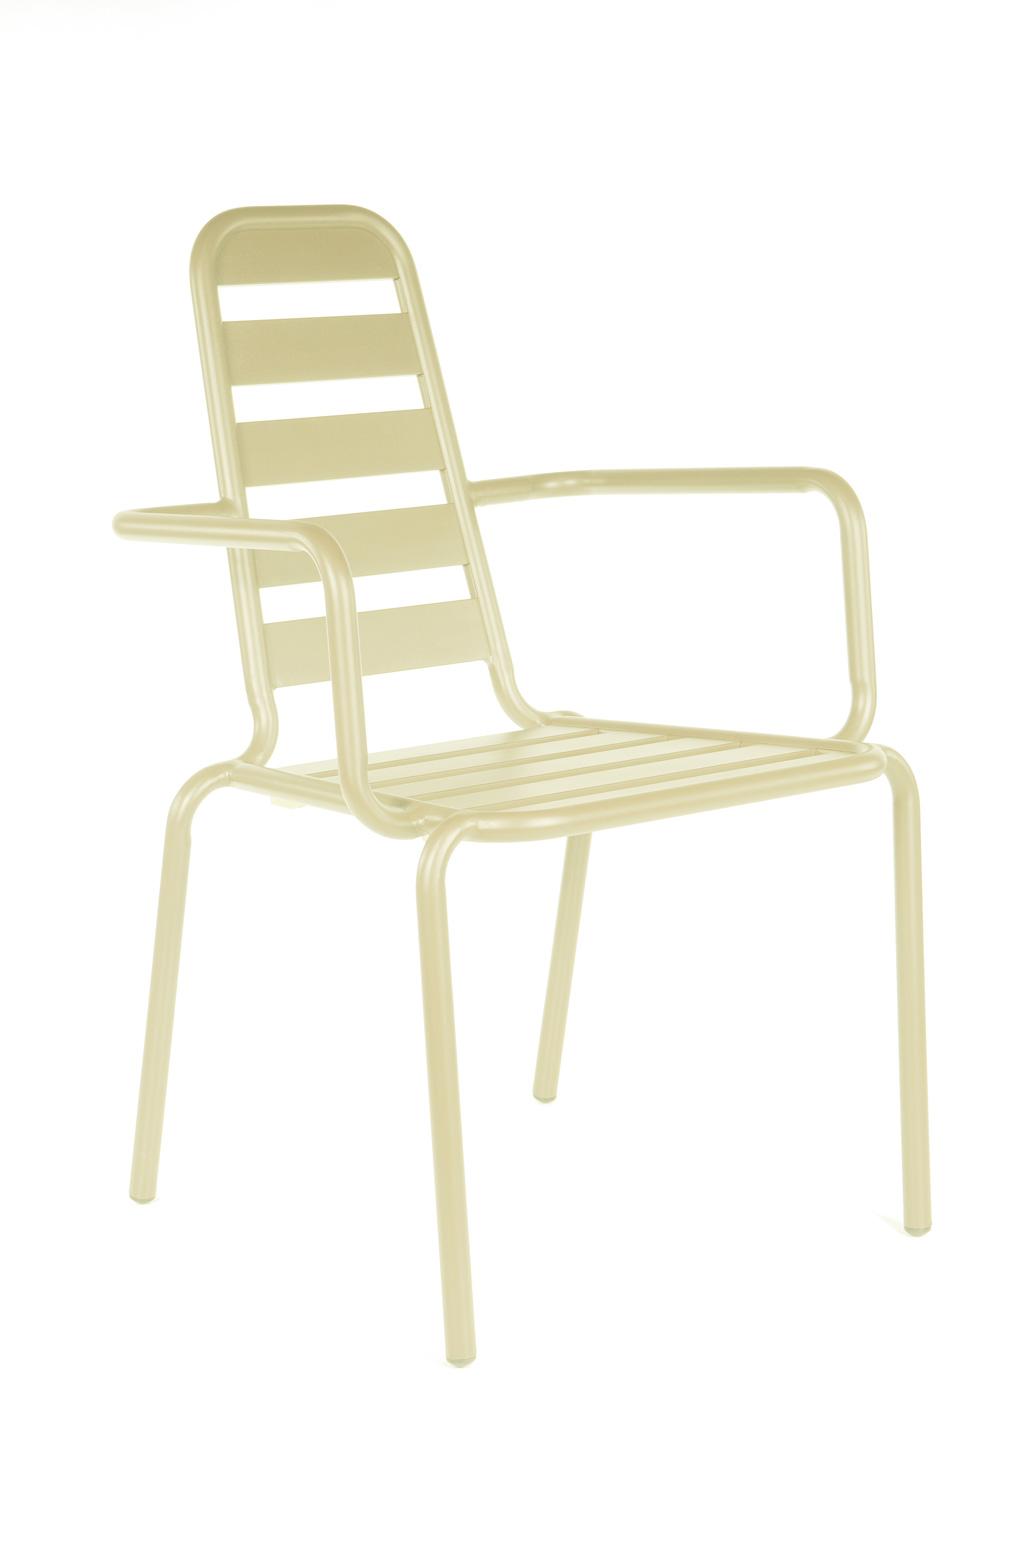 fauteuil menu nacre oceo sun mobilier. Black Bedroom Furniture Sets. Home Design Ideas